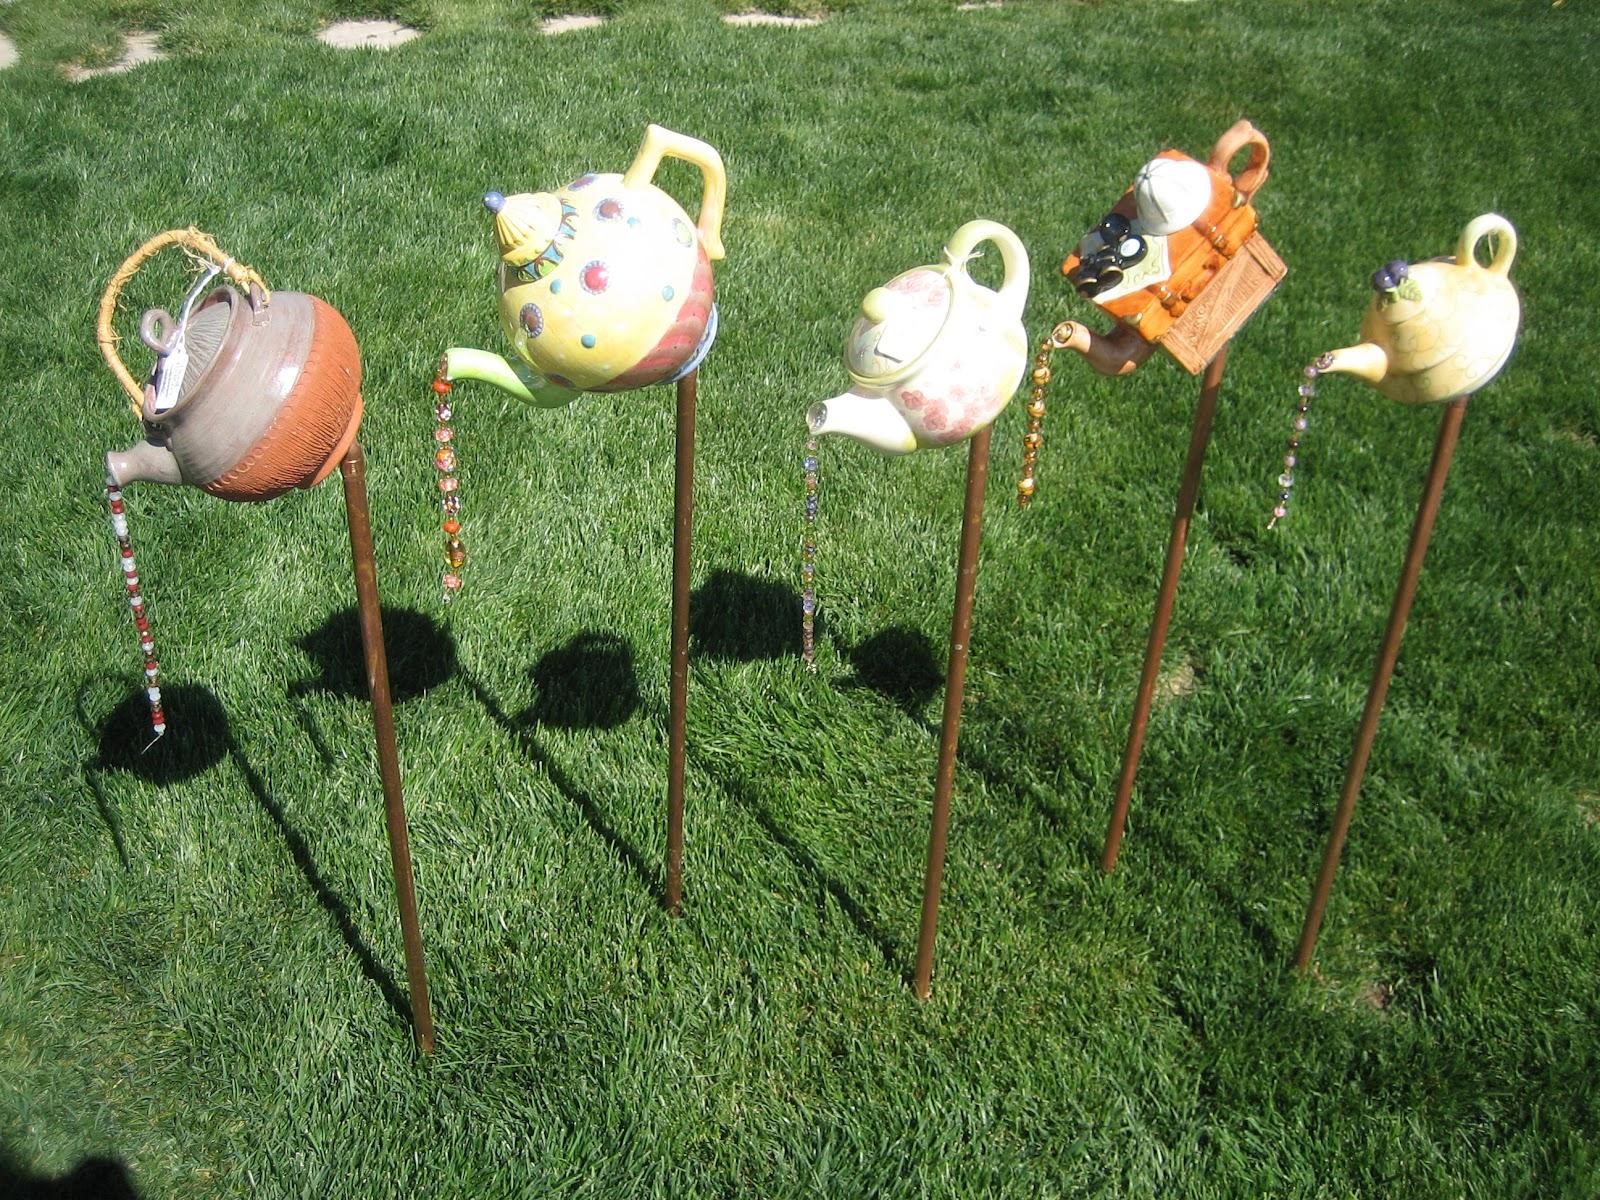 Repurposed designs by allen glassware totems birdfeeders for Lawn art patterns